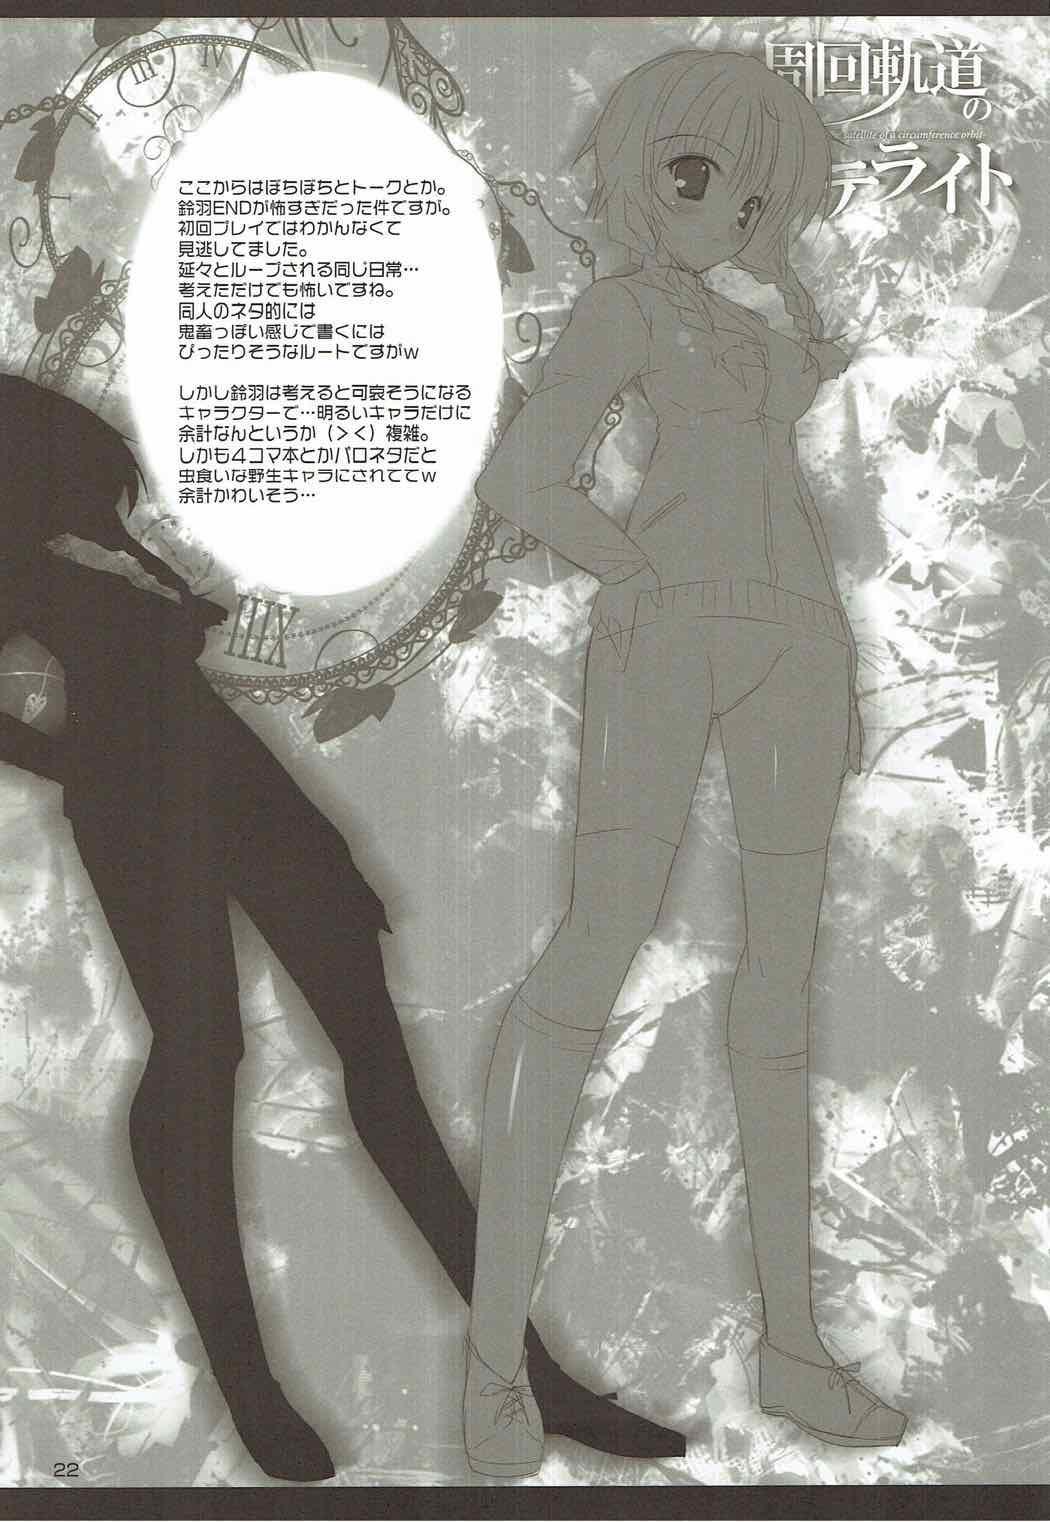 Shuukai Kidou no Satellite 20